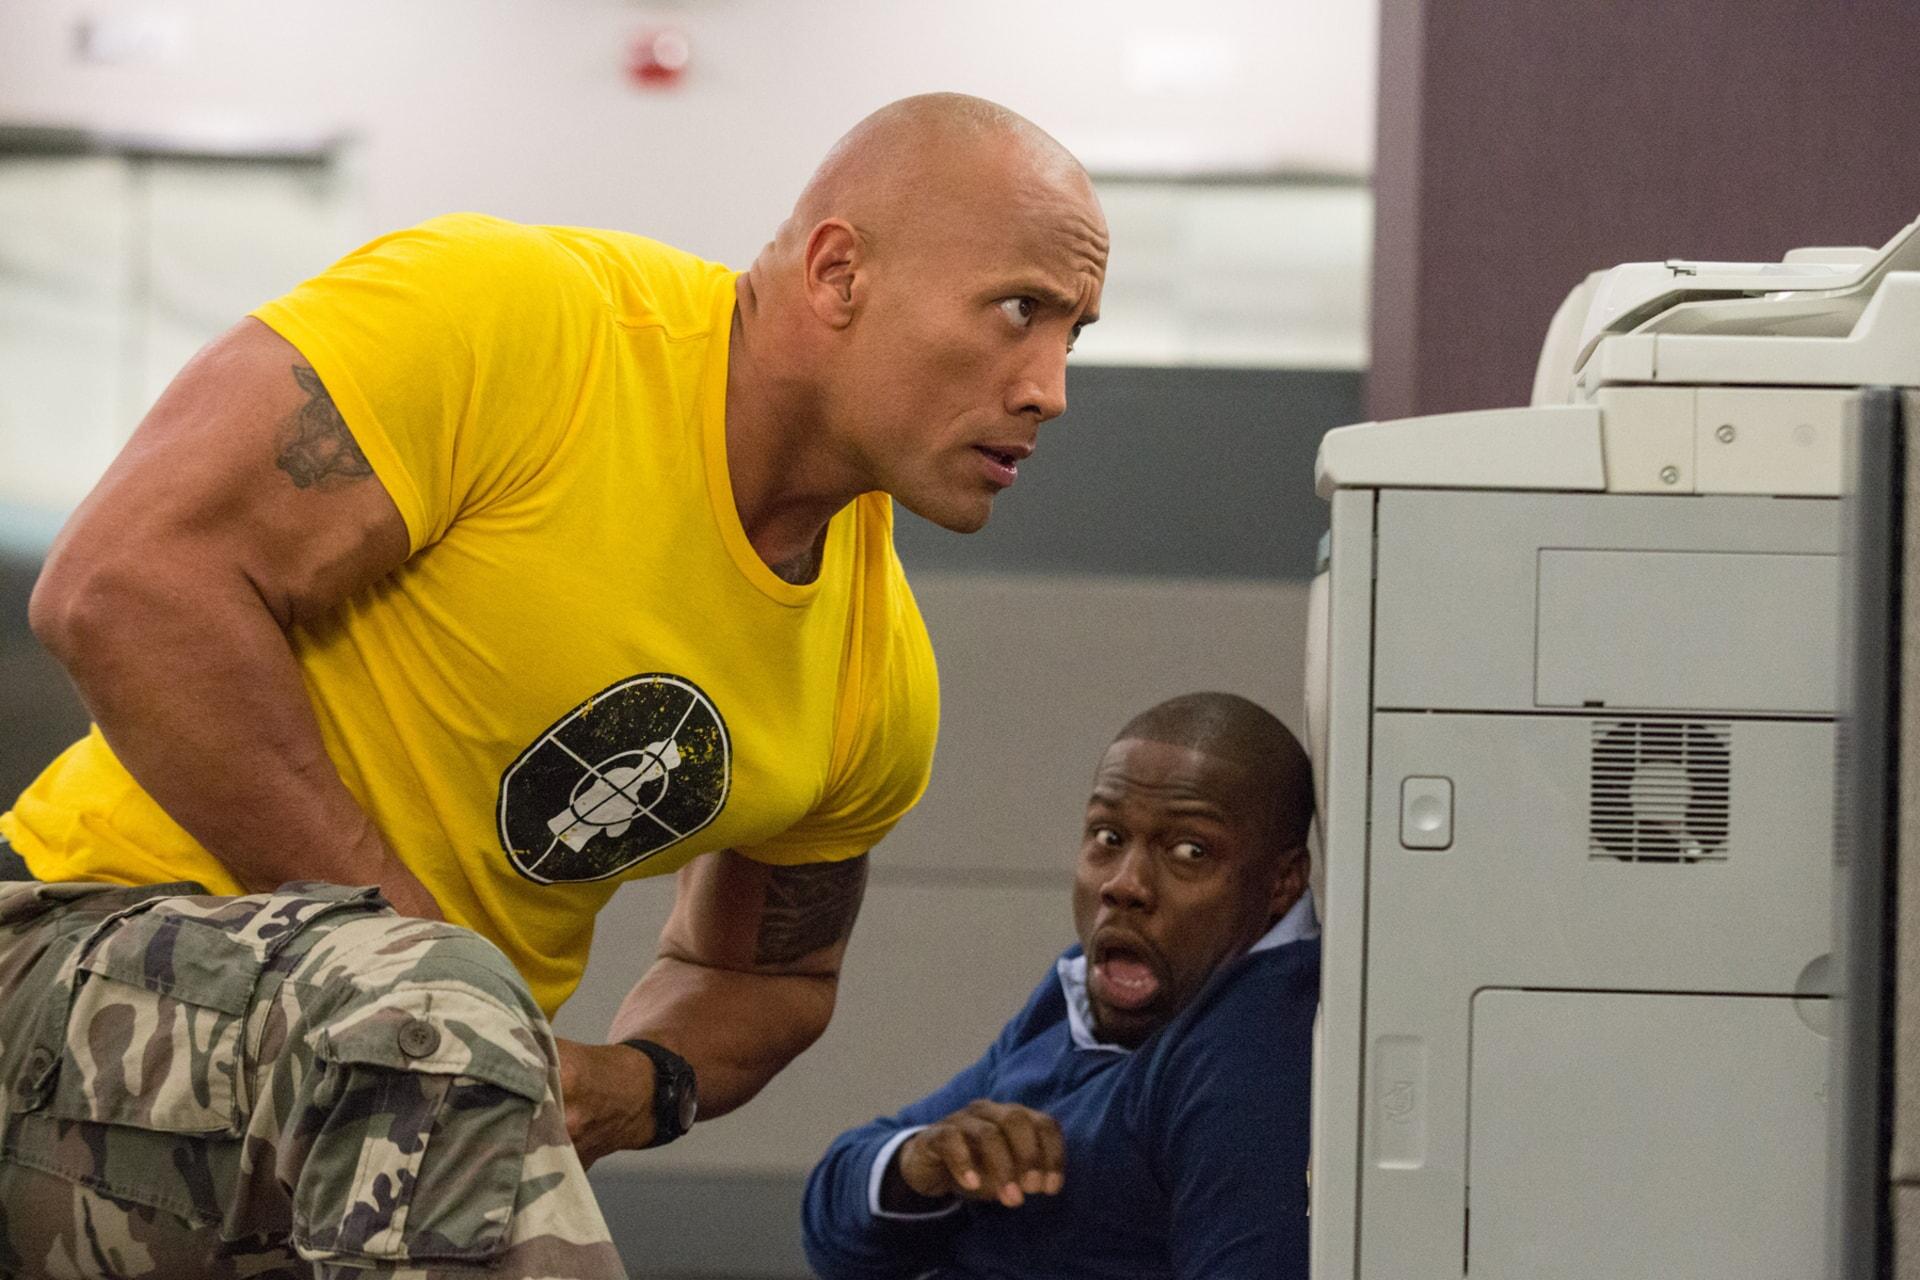 KEVIN HART as Calvin and DWAYNE JOHNSON as Bob crouching down behind office equipment